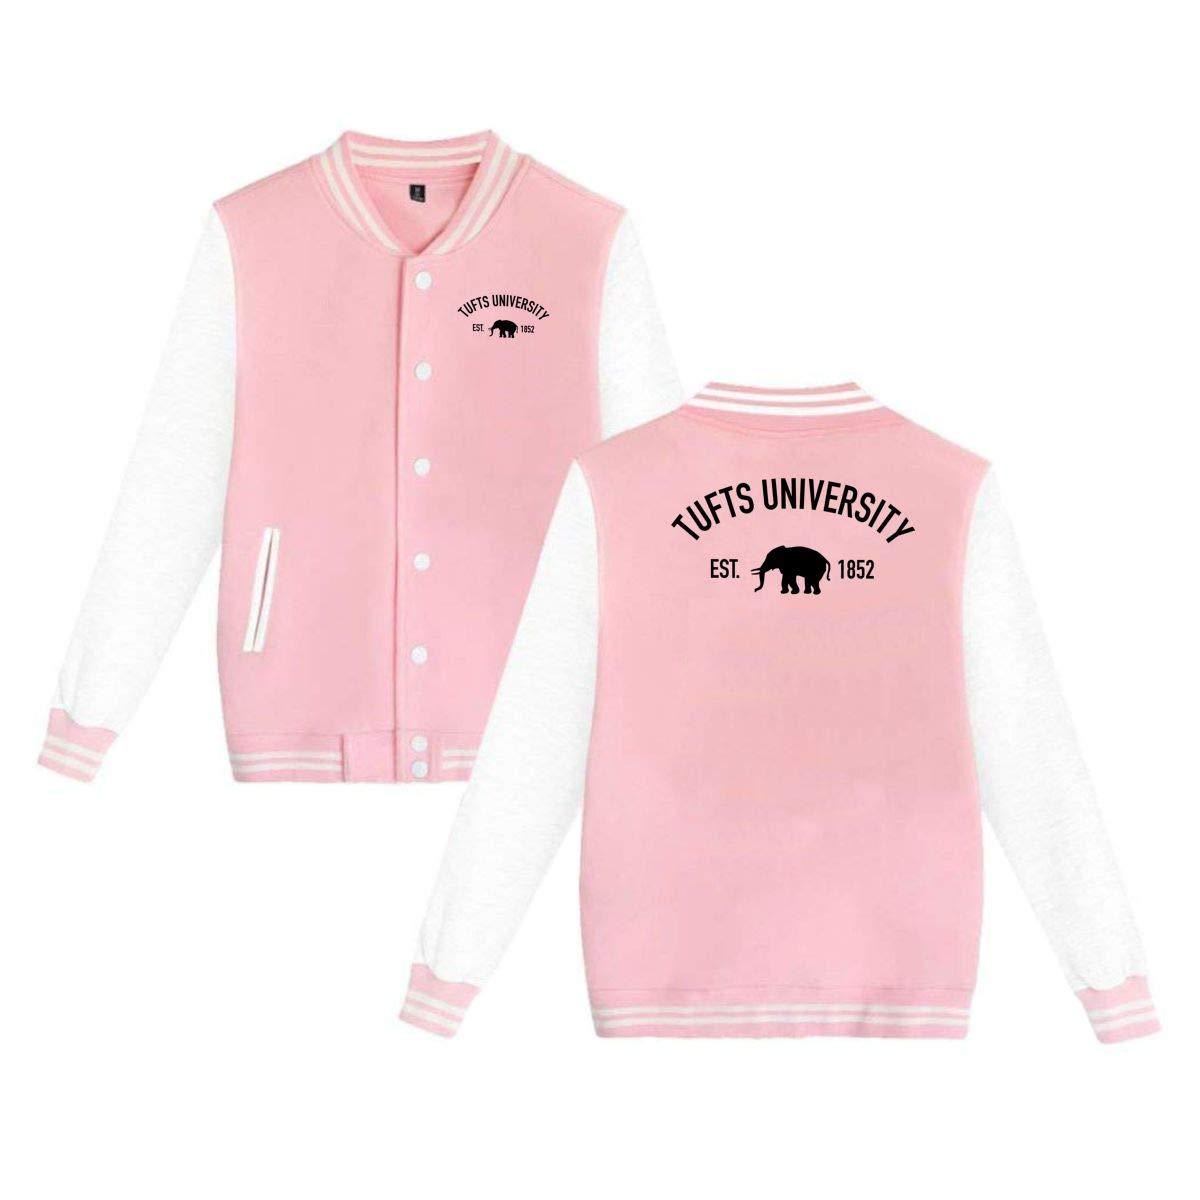 QTHOO Unisex Tufts University Established 1852 Long Sleeve Velvet Warm Casual Baseball Uniform Jacket Button Sport Coat